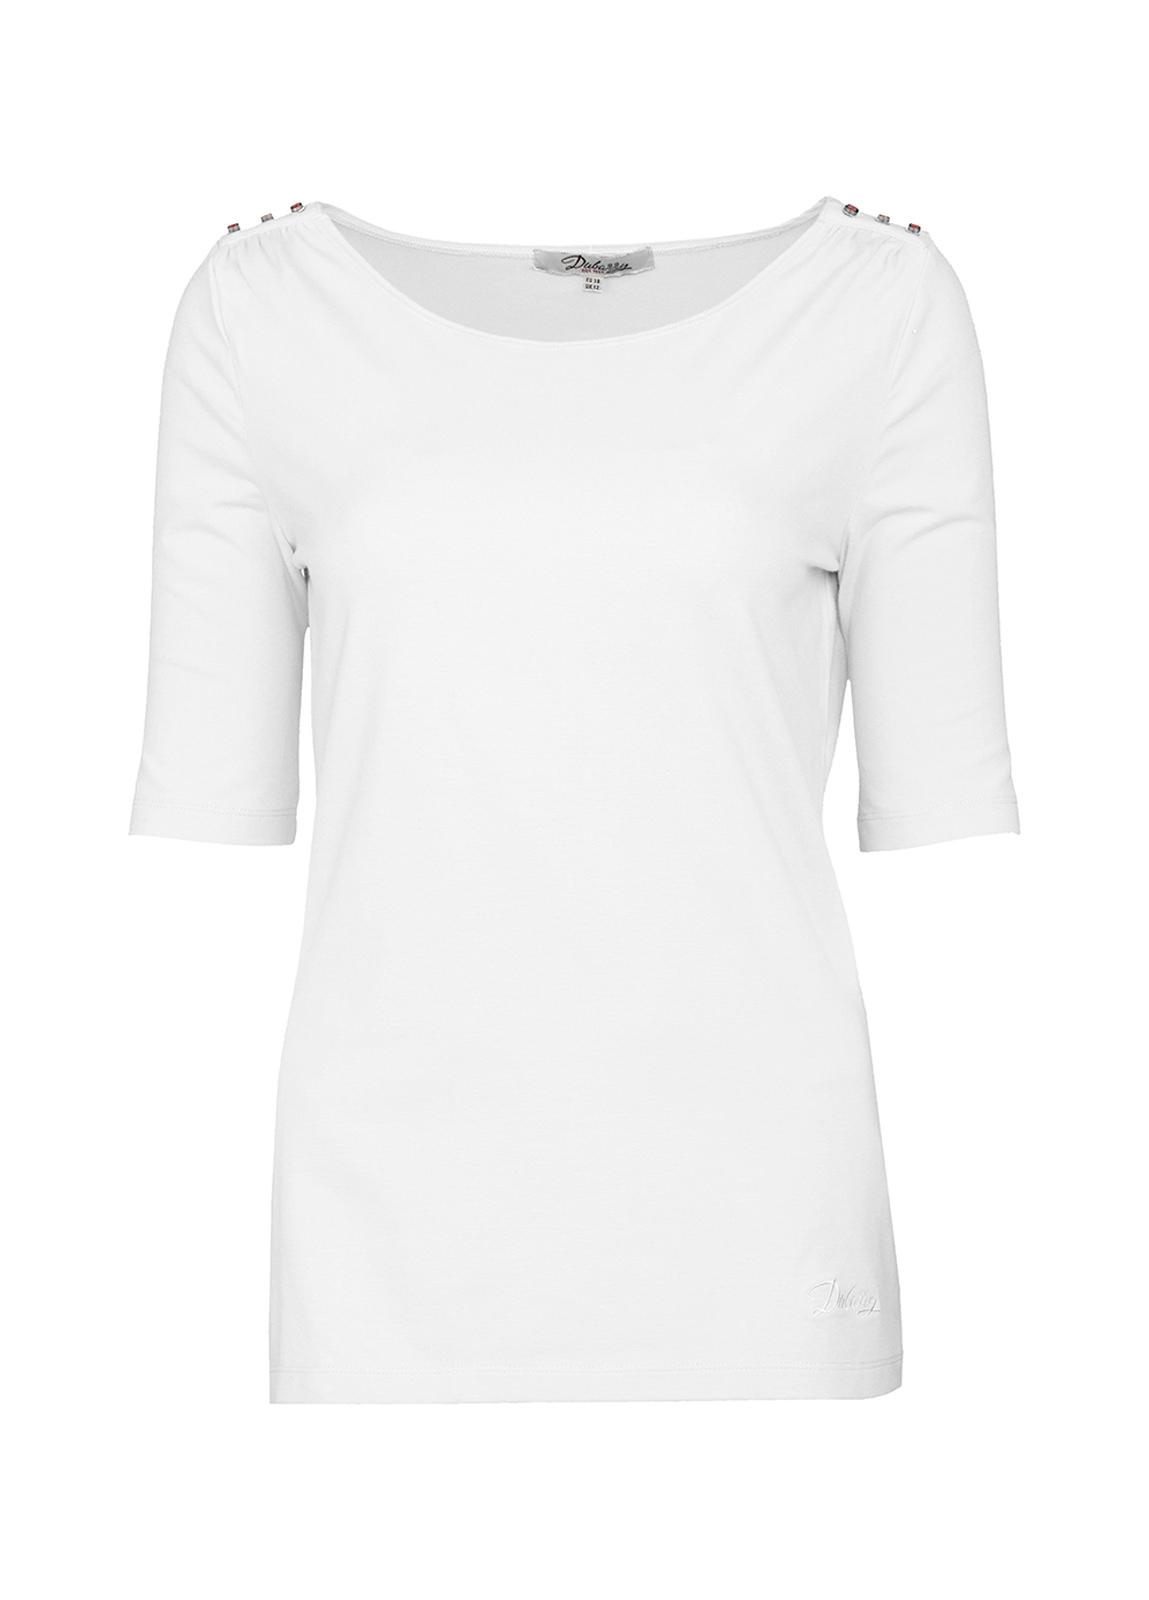 Corofin Ladies Top - White